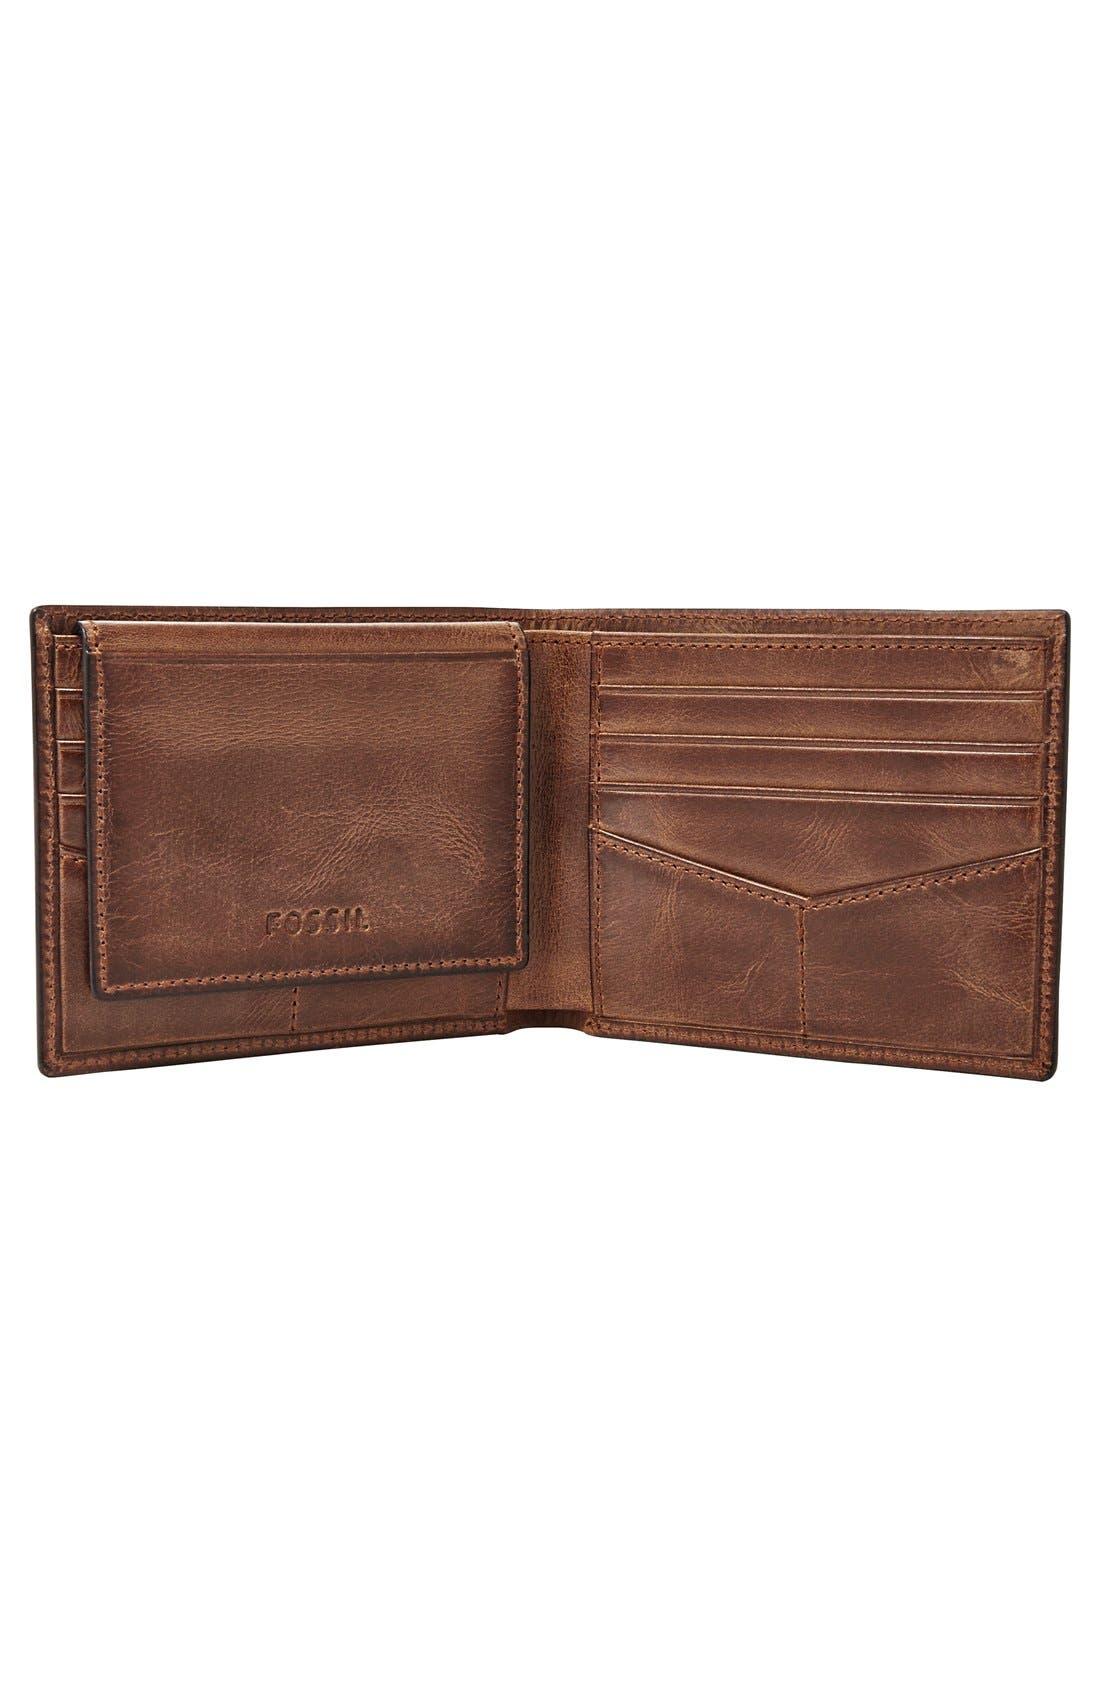 Alternate Image 3  - Fossil 'Derrick' Leather Flip Trifold Wallet